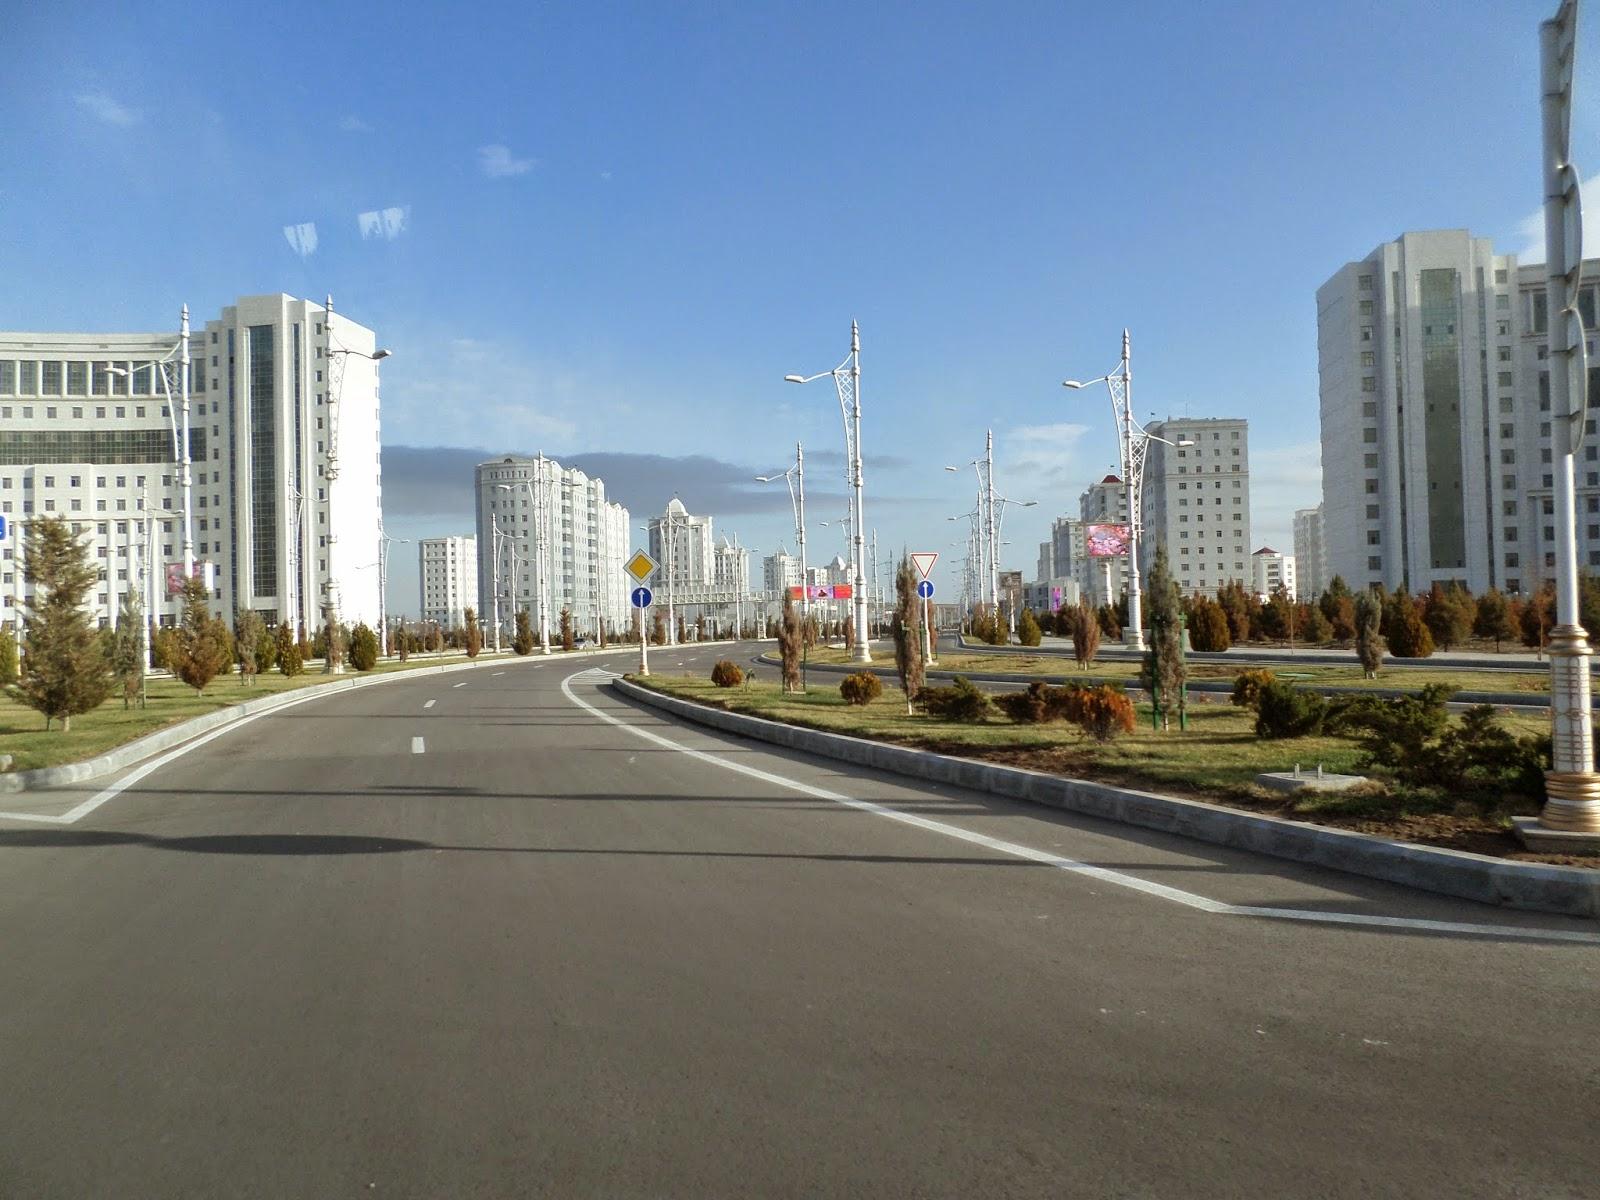 http://kulikinkyrgyzstan.blogspot.in/2014/04/ashgabat-turkmenistan.html